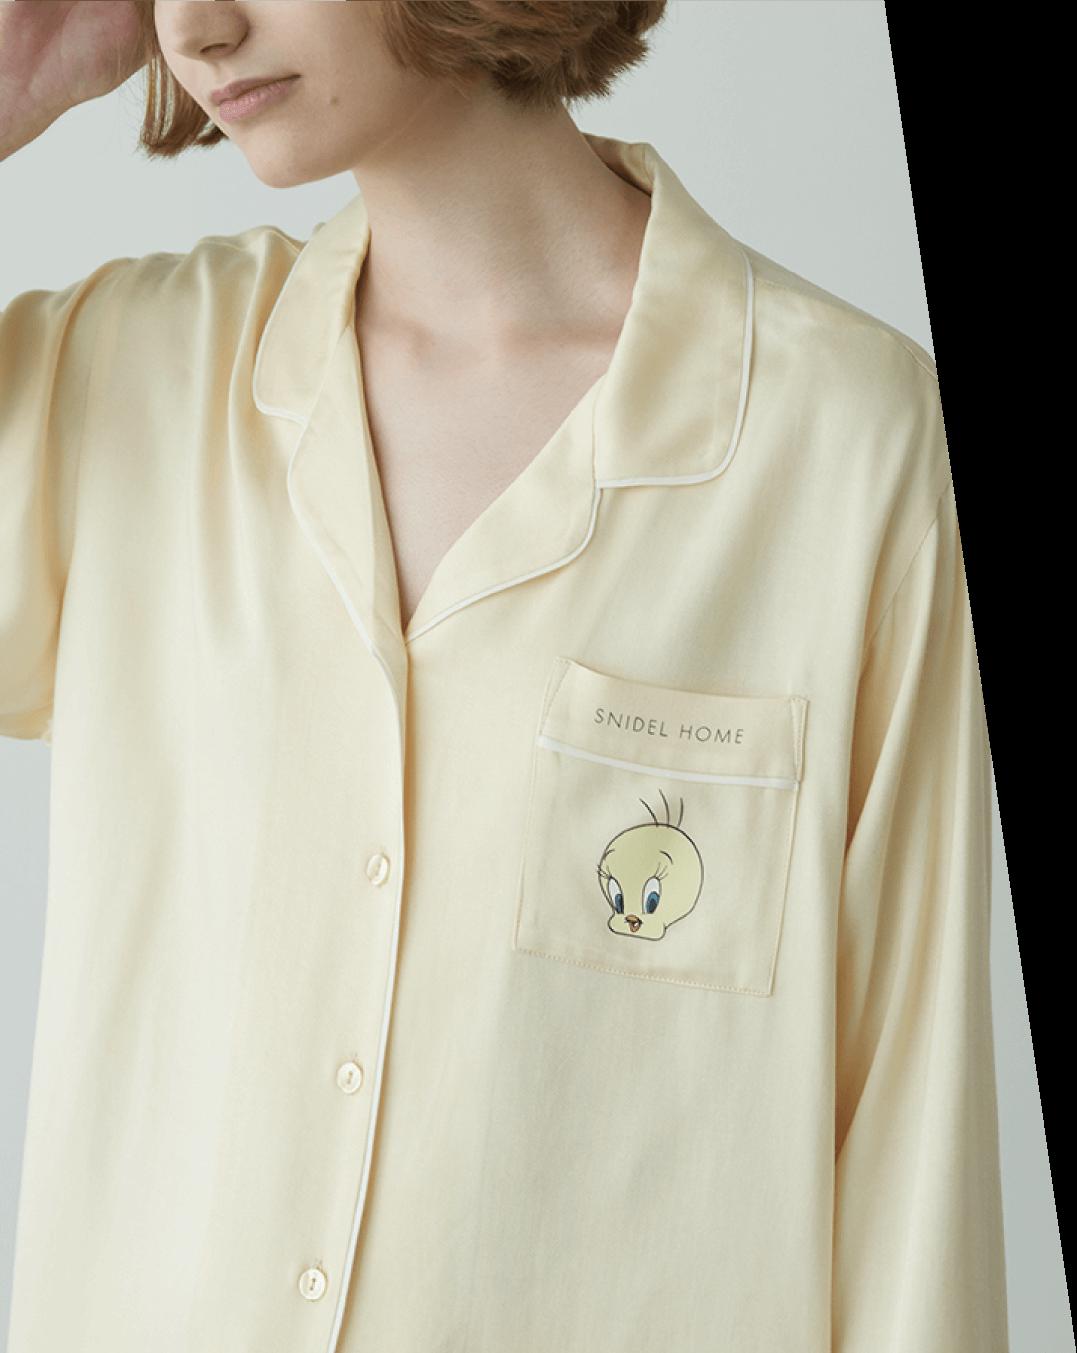 Shirt ¥8,250 , Pants ¥7,920 , Room Shoes ¥3,960